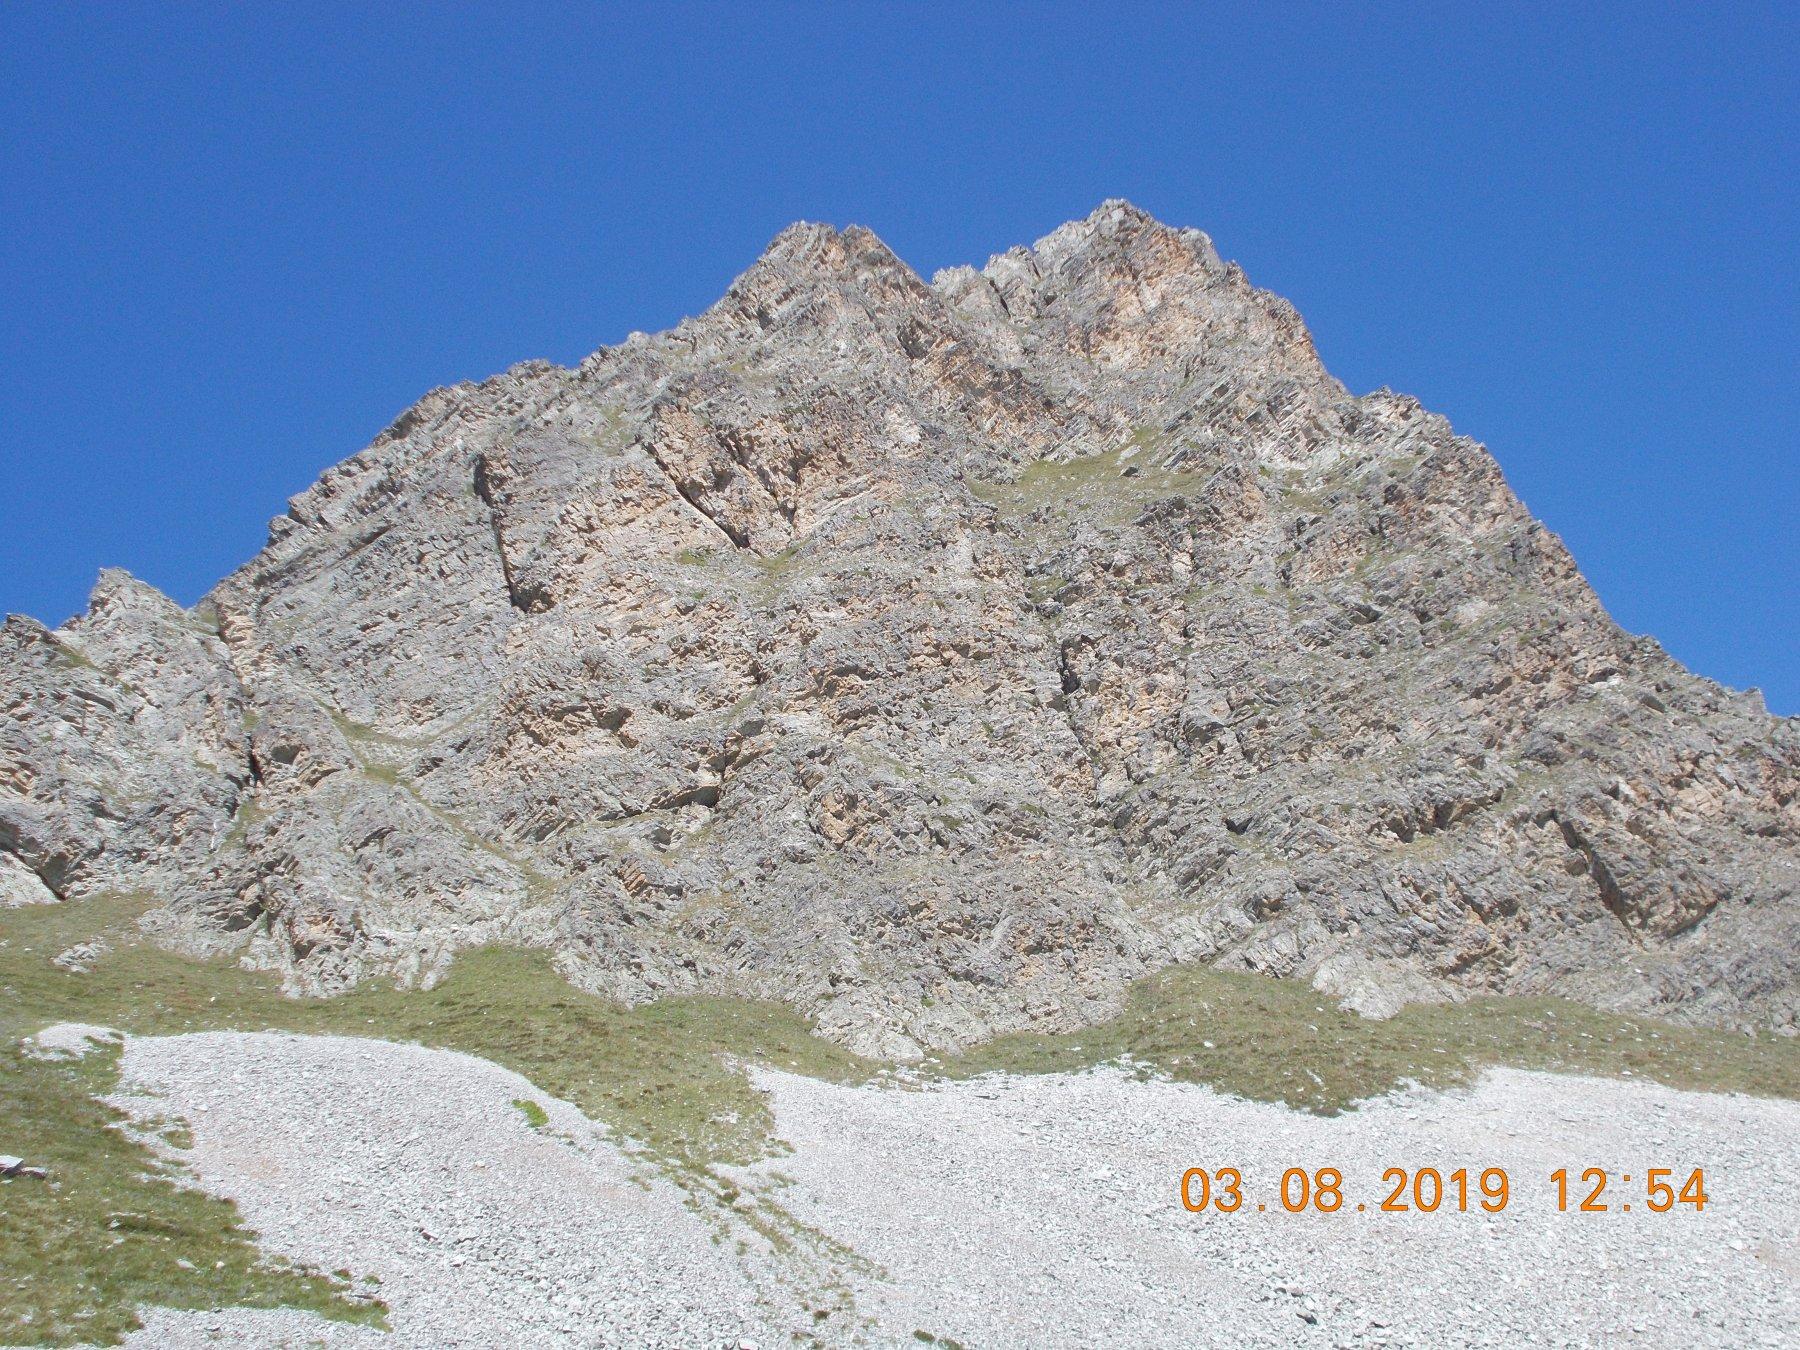 Monte Pelvo di Chiausis 2732m da Pian Traversagn 2400m